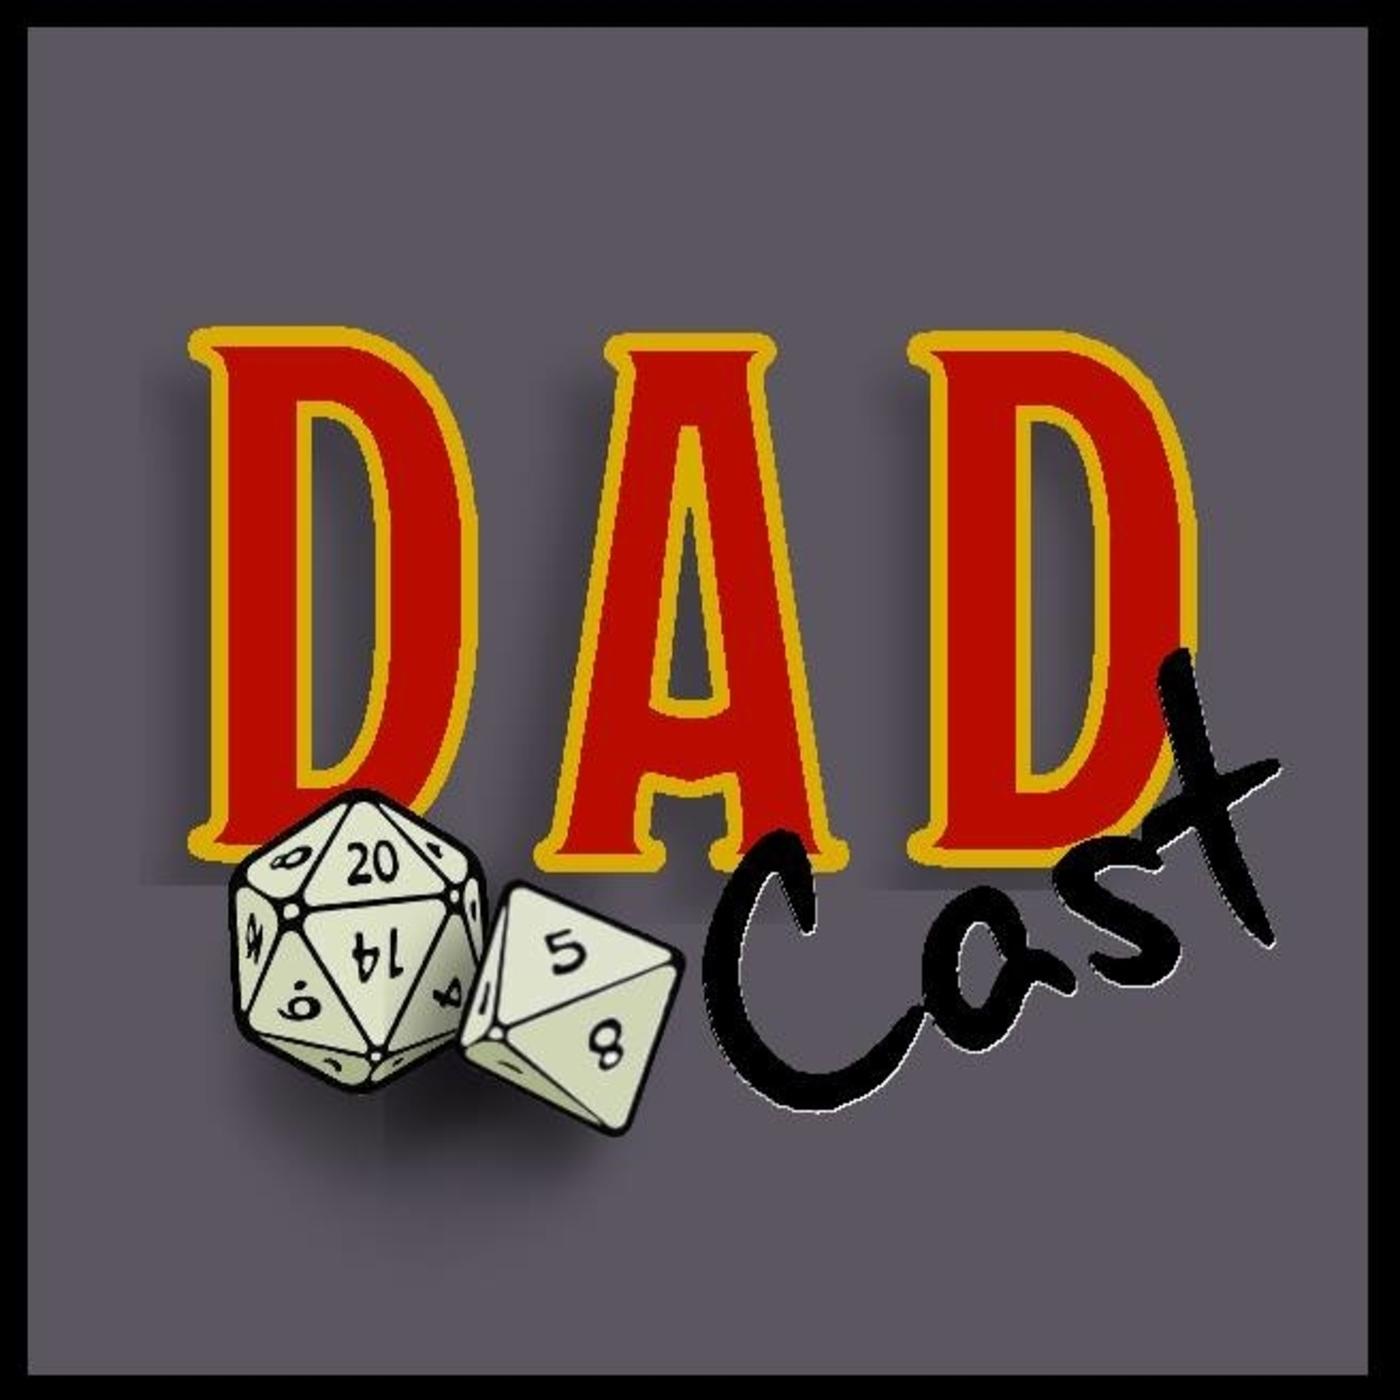 DADcast: A D&D Podcast show art